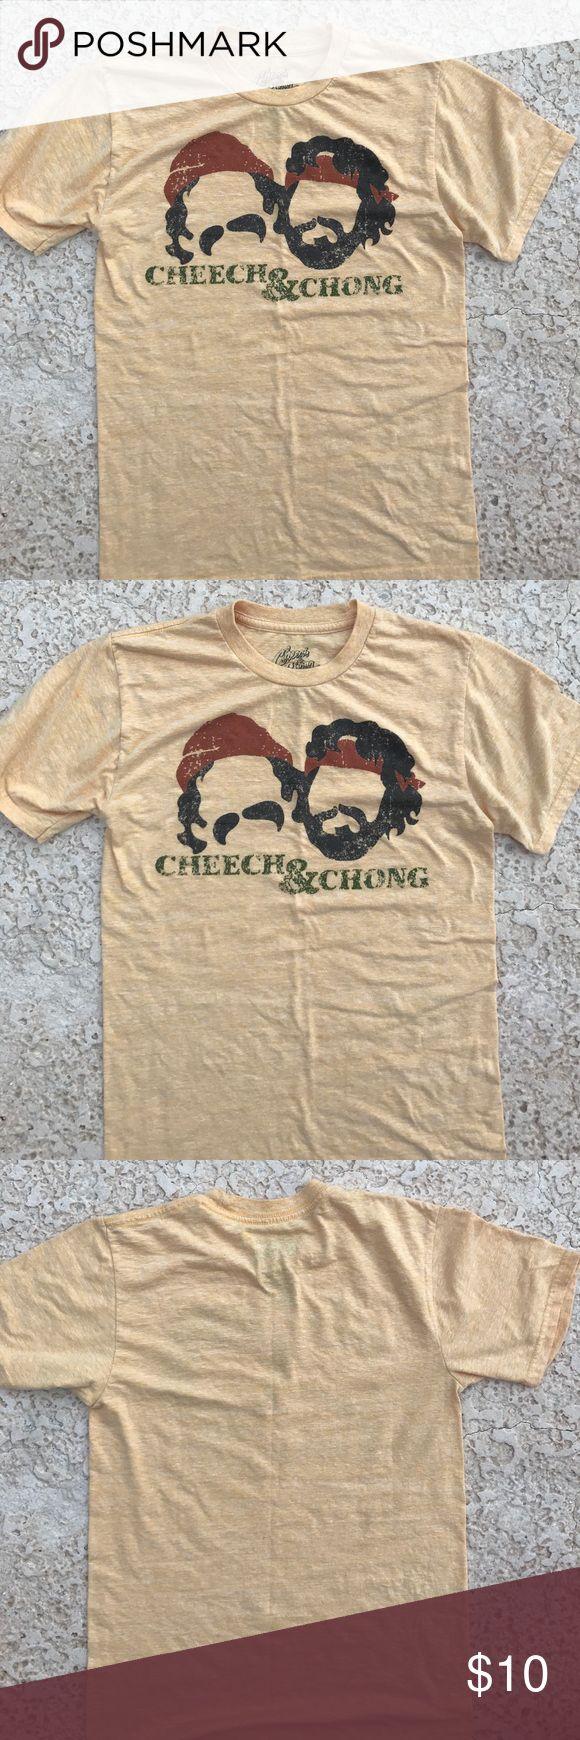 CHEECH & CHONG. YELLOW TShirt. Size Small CHEECH & CHONG. TEE SHIRT SIZE SMALL Cheech & Chong Tops Tees - Short Sleeve